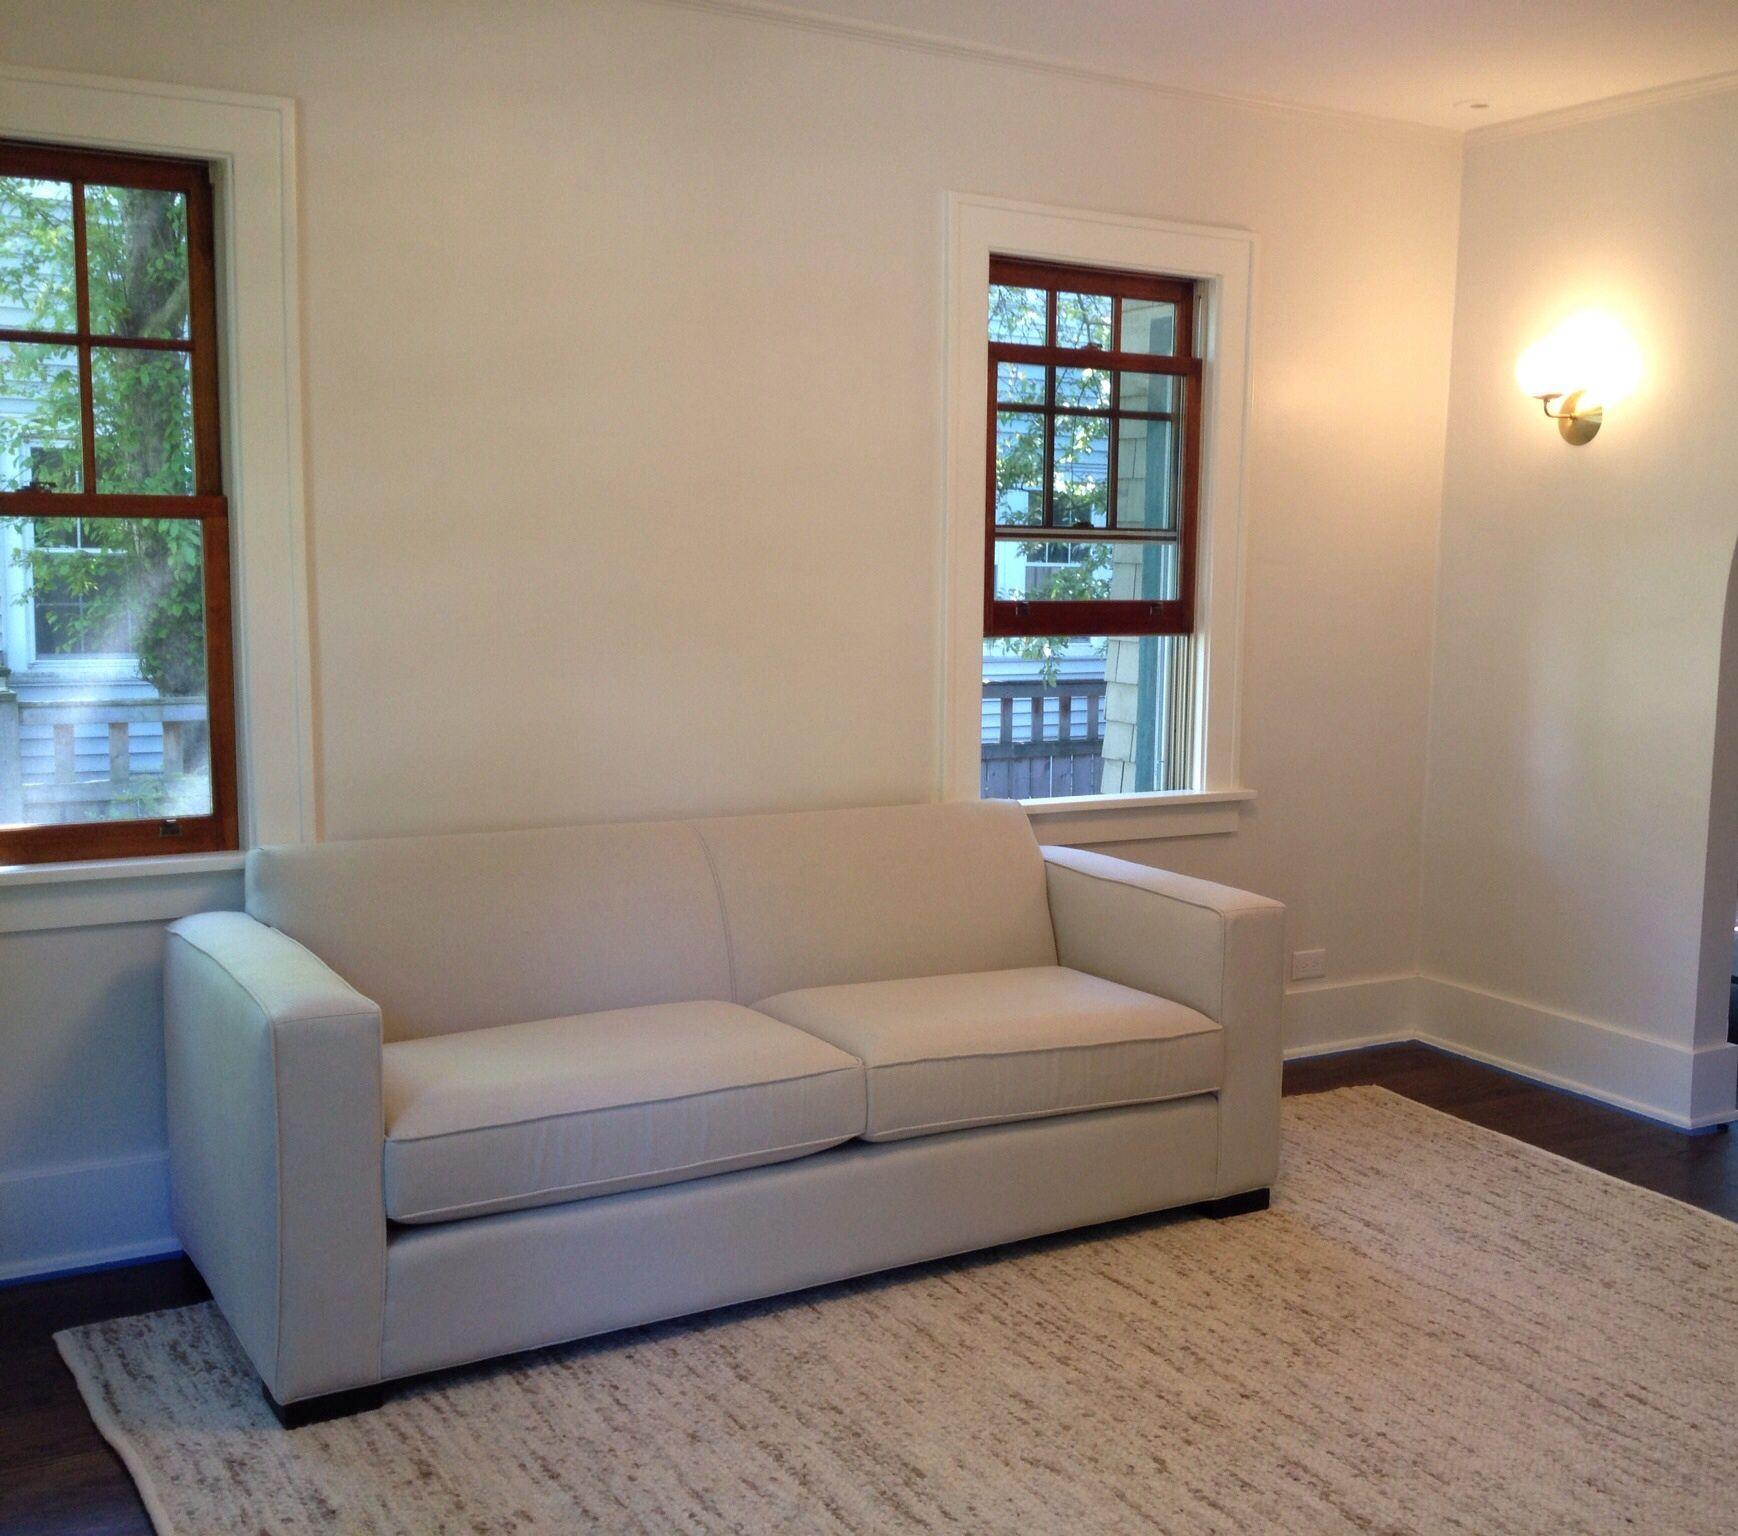 Family room progress stage 1 | Kristin Kerr interiors